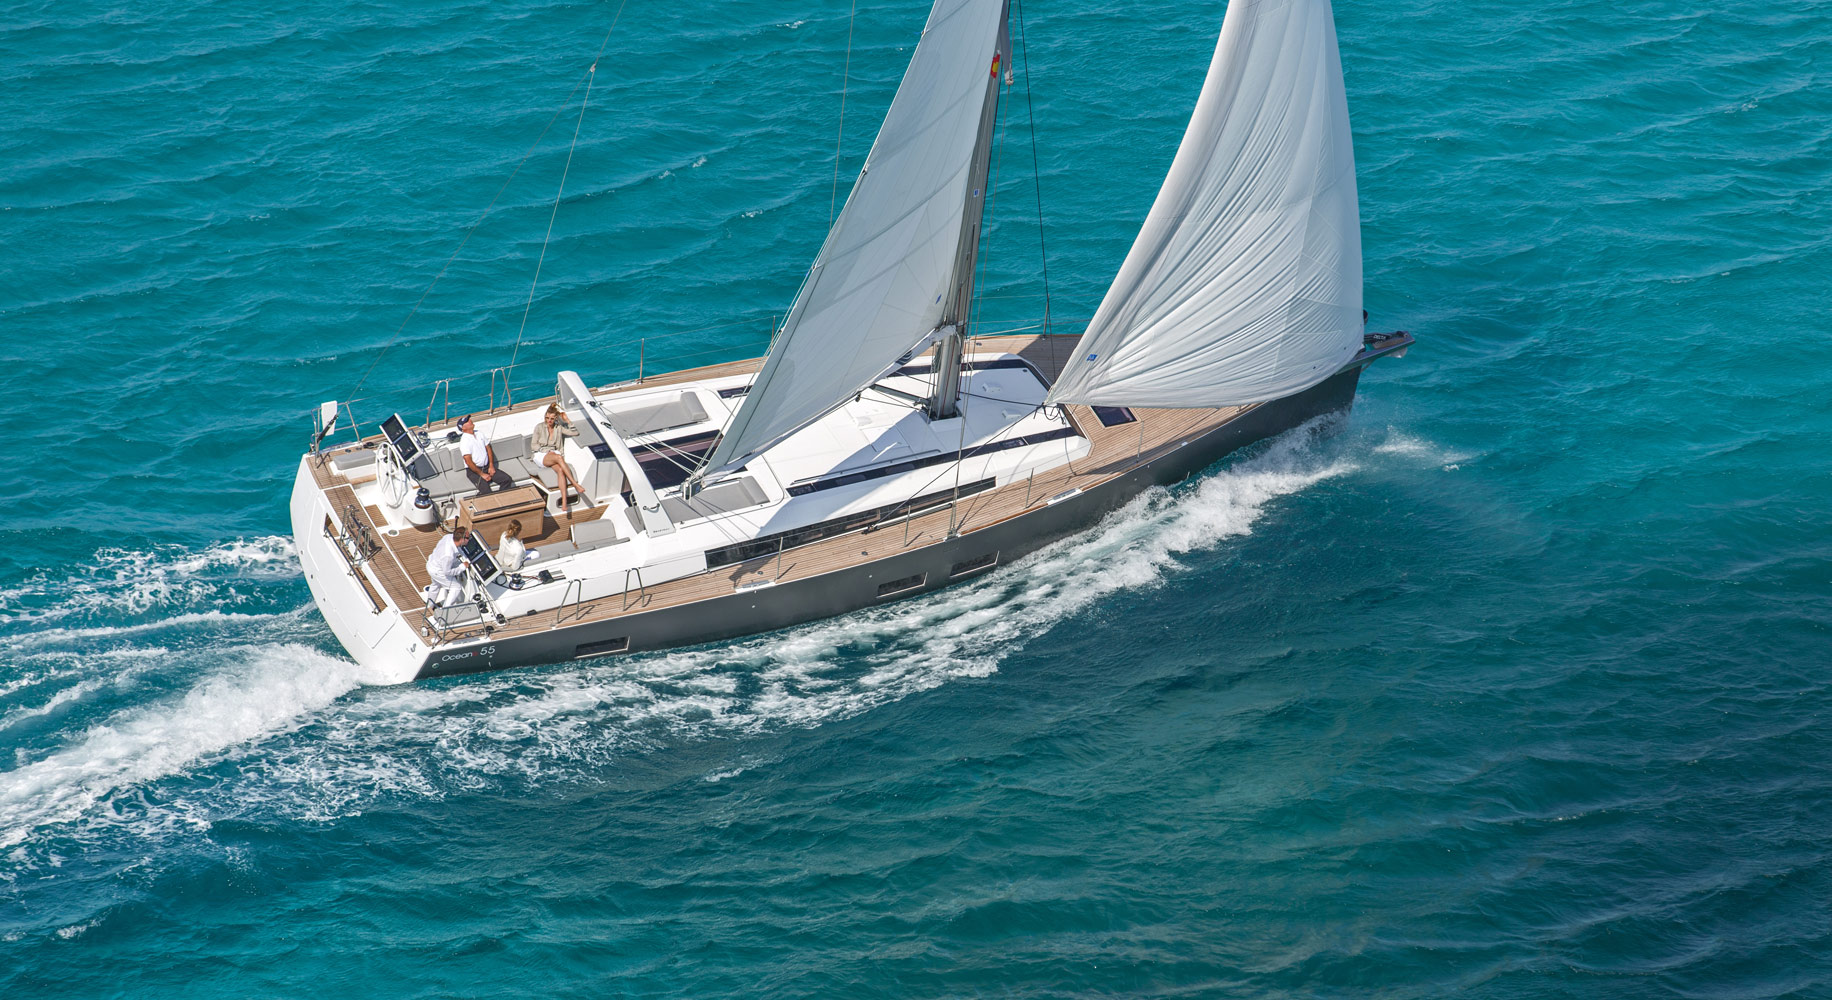 Oceanis 55 Class - Sailing Yacht- Oceanis 55 (5Cab)